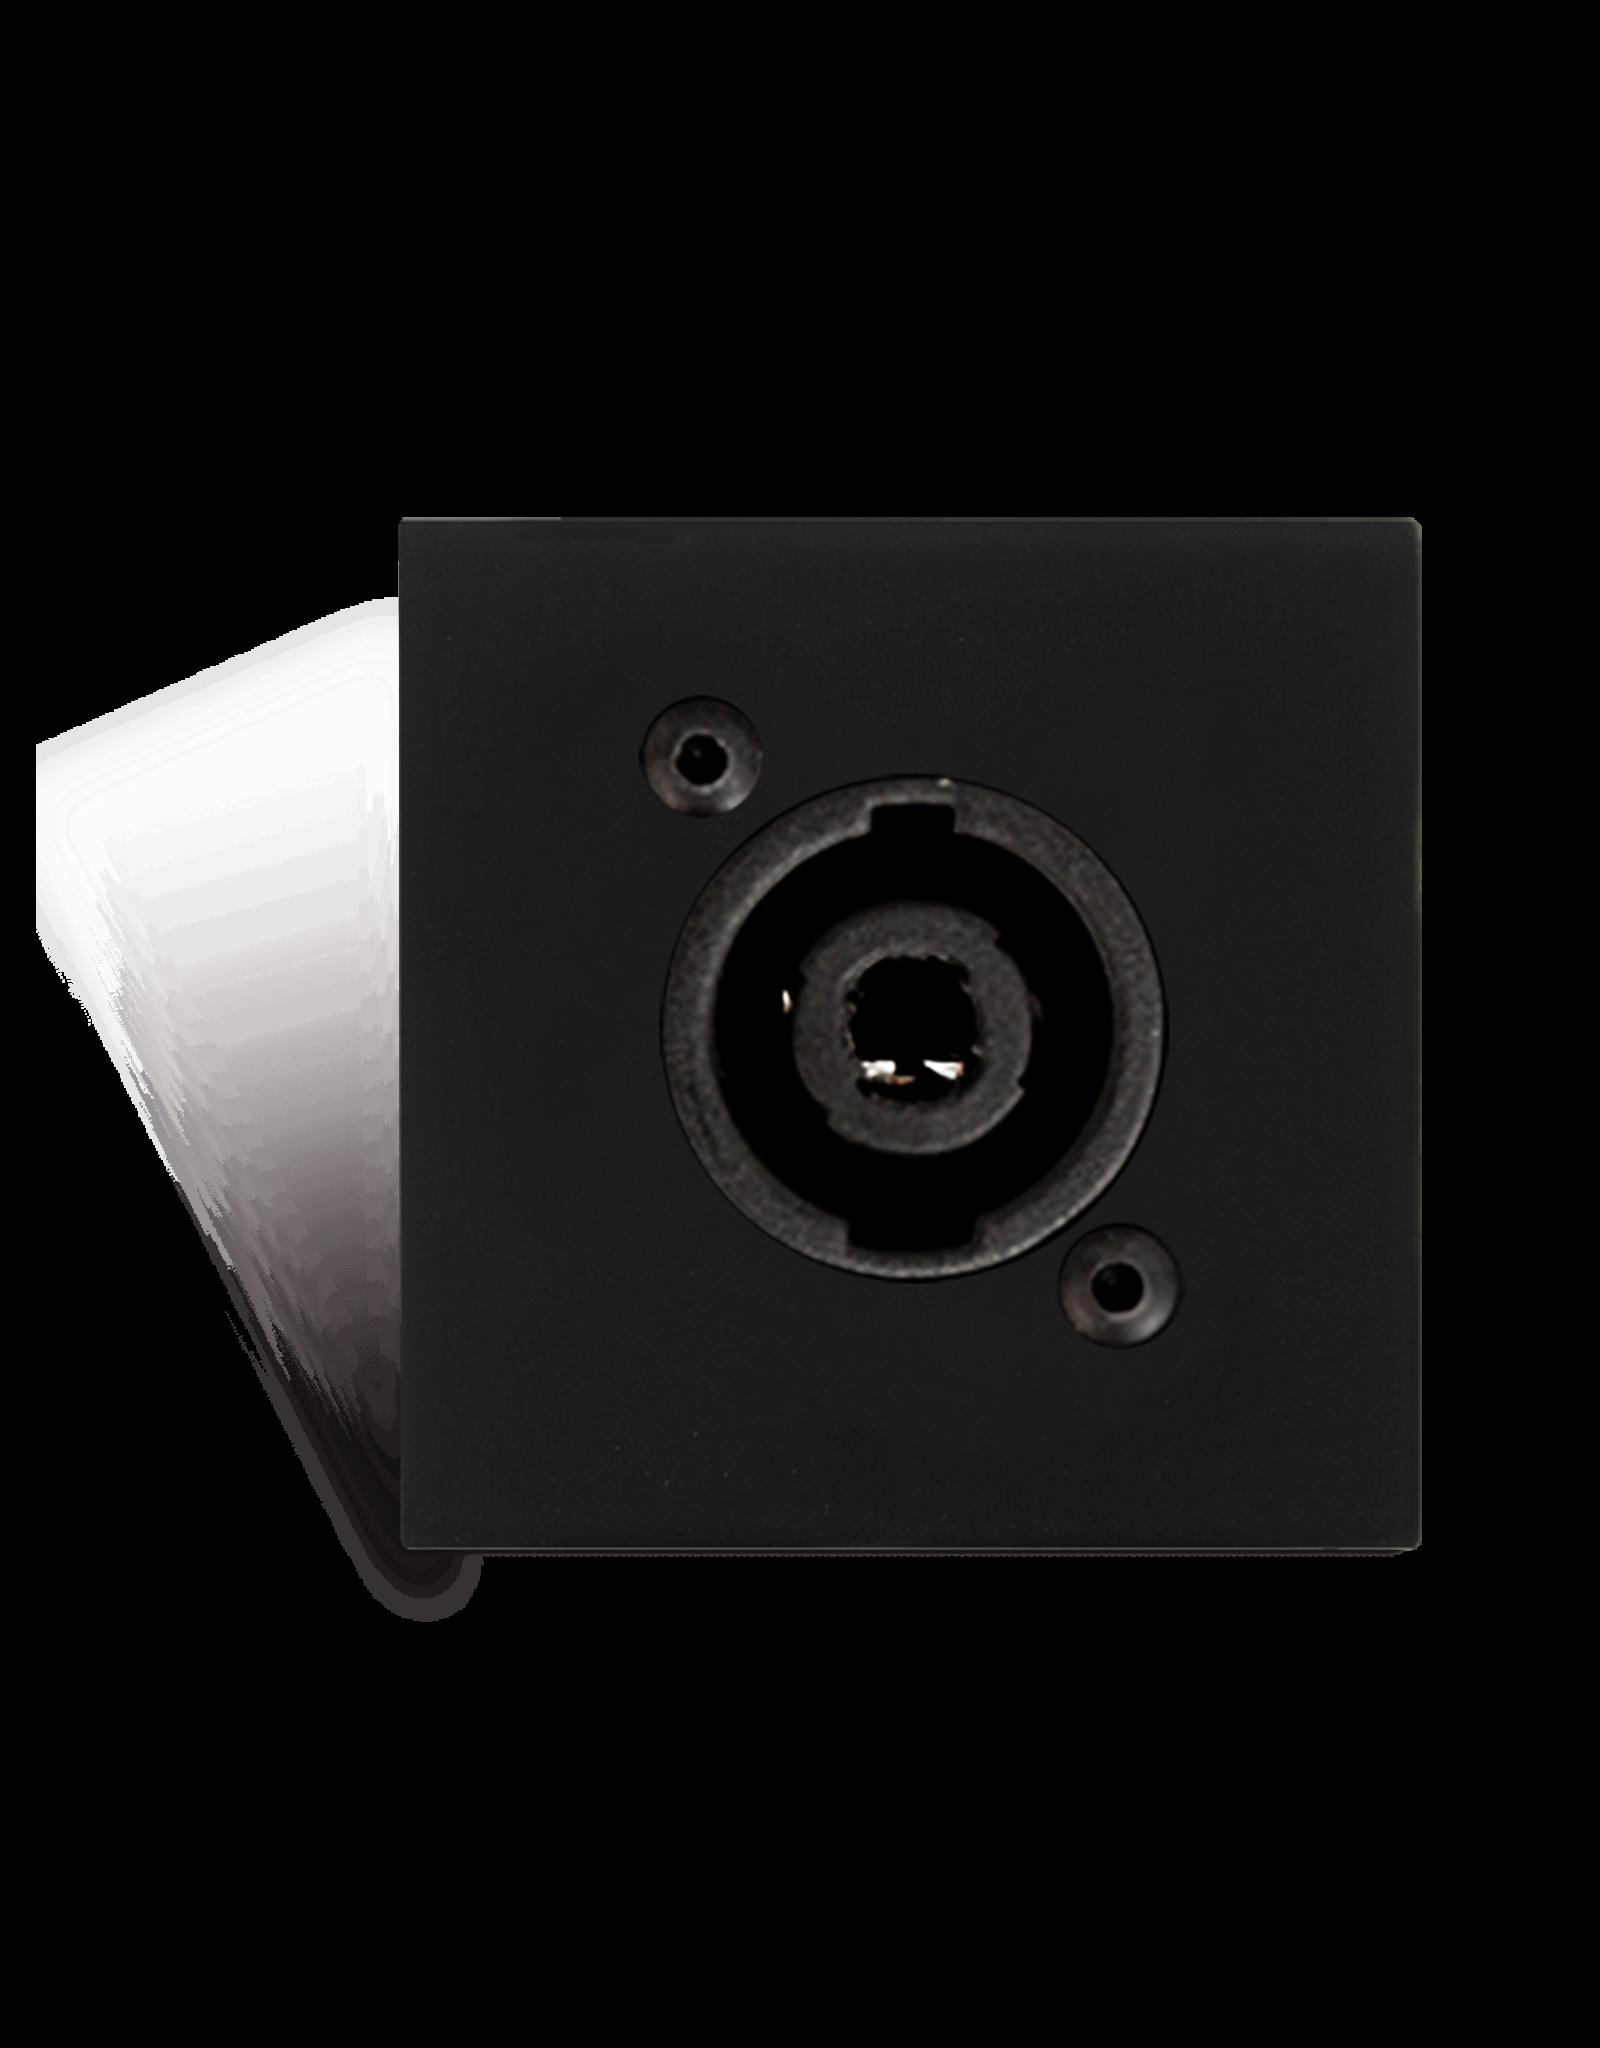 Audac Connection plate D-size speaker 45 X 45 mm - solderless Black version